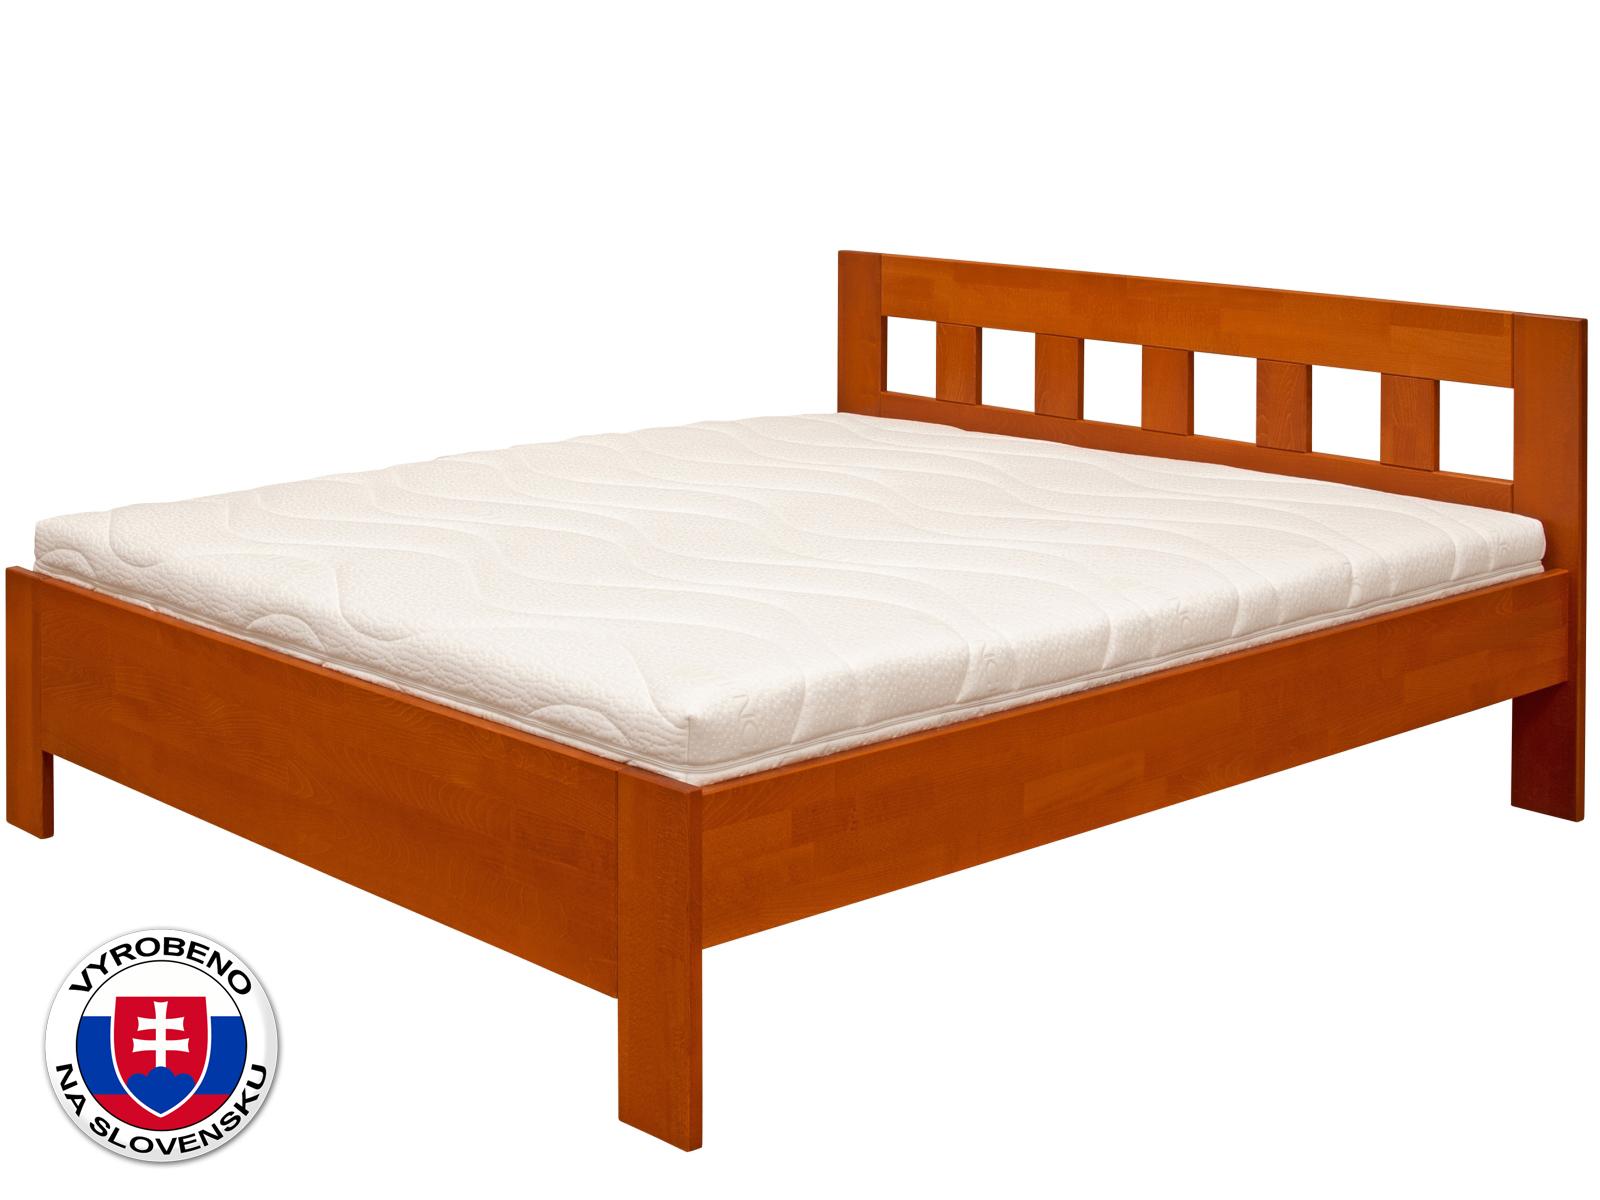 Manželská postel 180 cm - Purtex - Poppy (masiv)